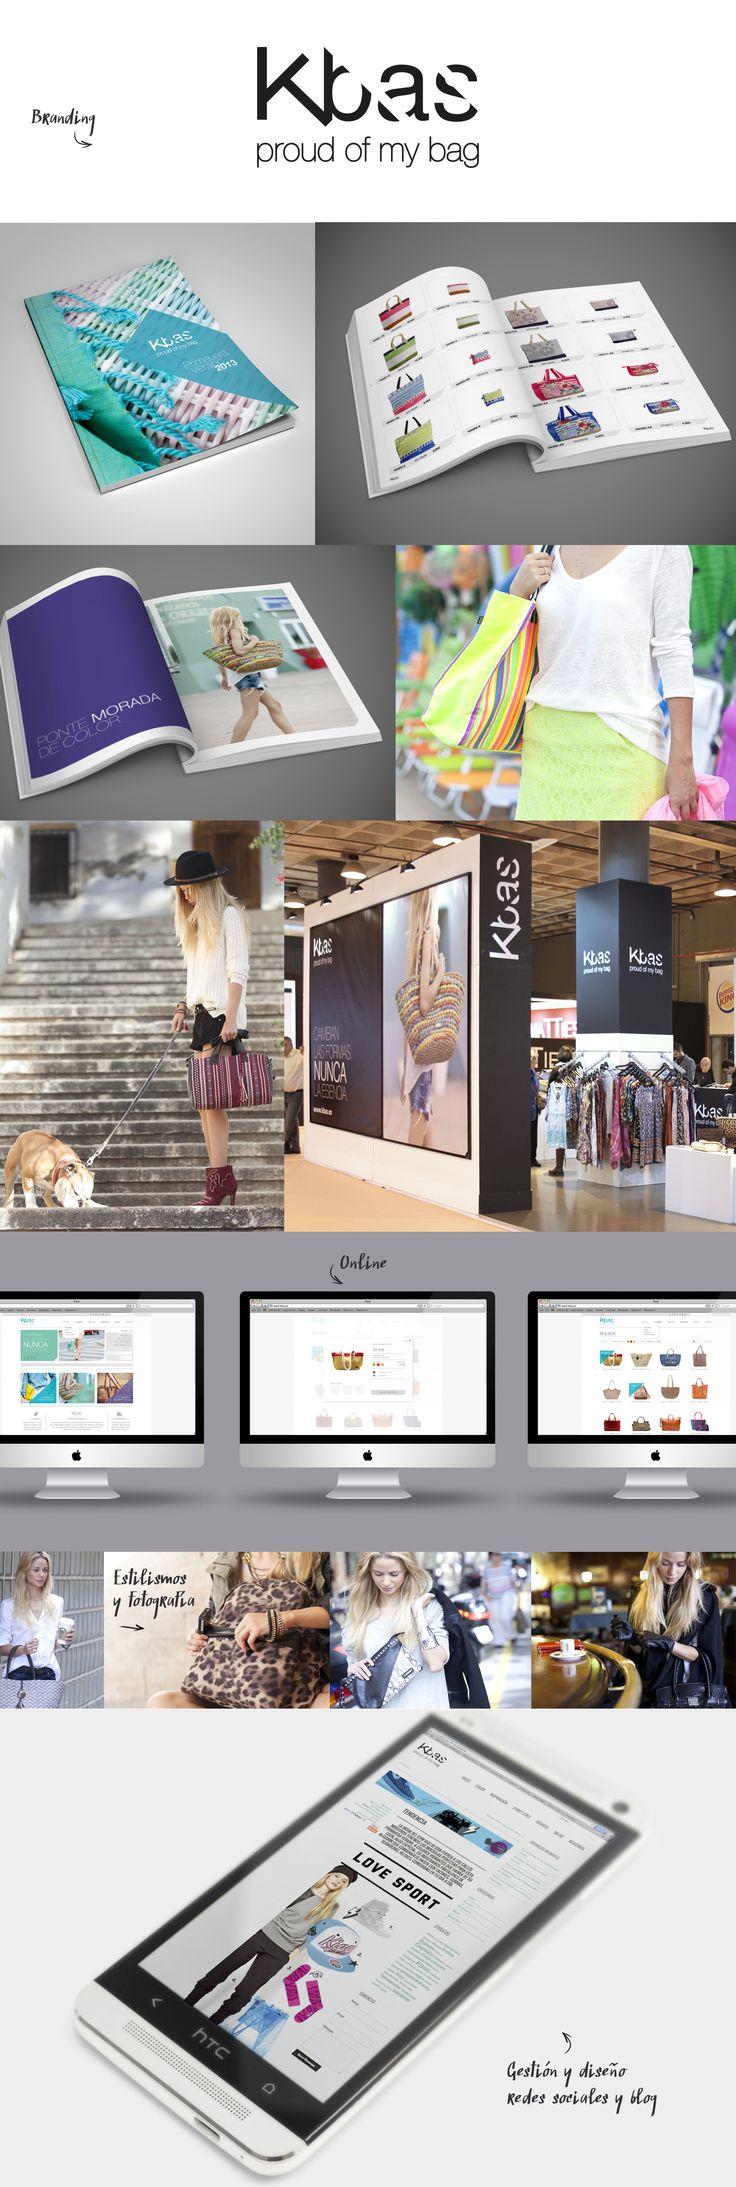 #KBAS #wannaone #branding #estilismo #fotografia #stand #web #design #graphic #brand #style